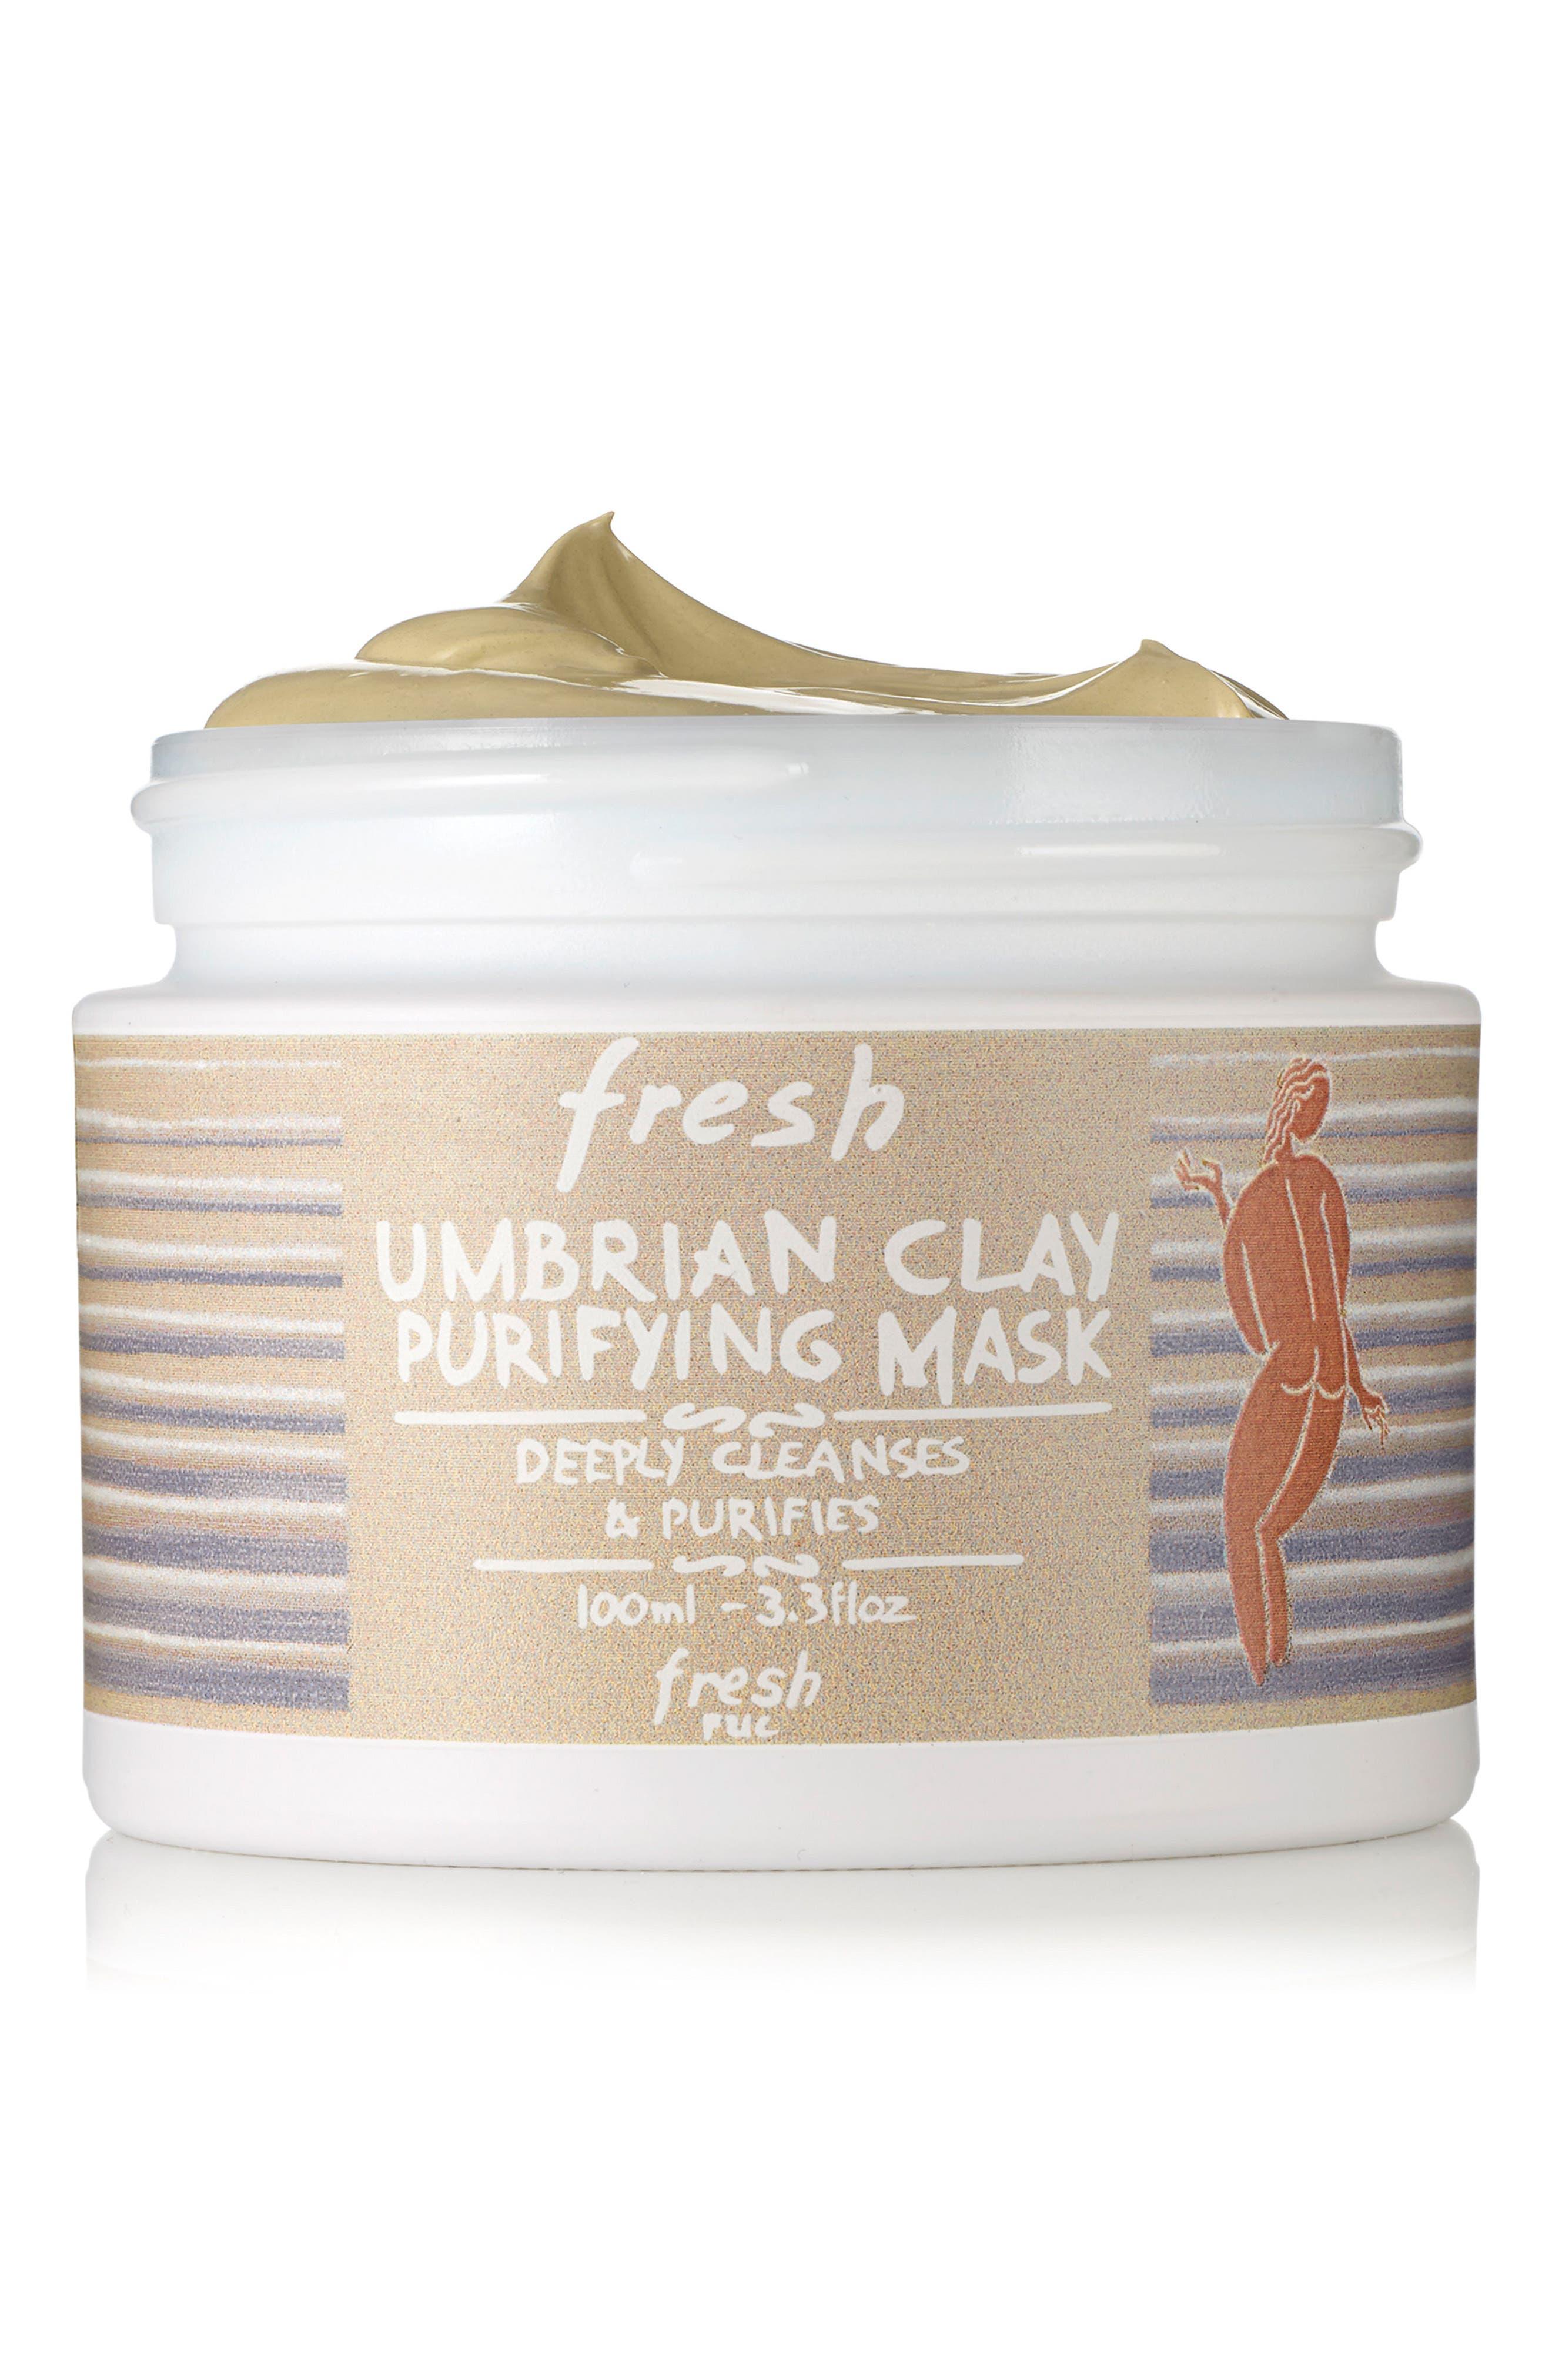 Alternate Image 1 Selected - Fresh® Umbrian Clay Purifying Mask